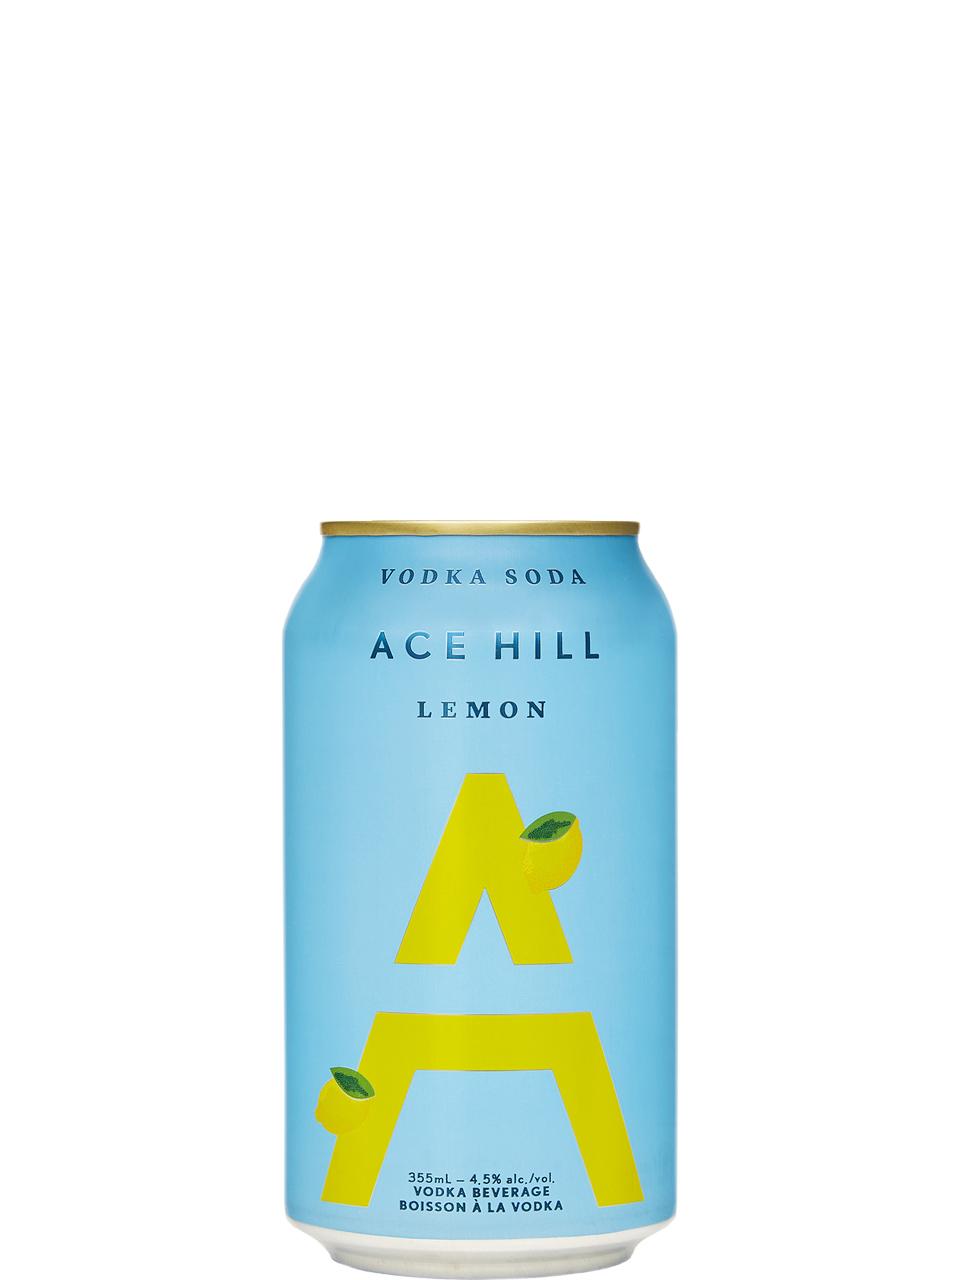 Ace Hill Lemon Vodka Soda 355ml Can